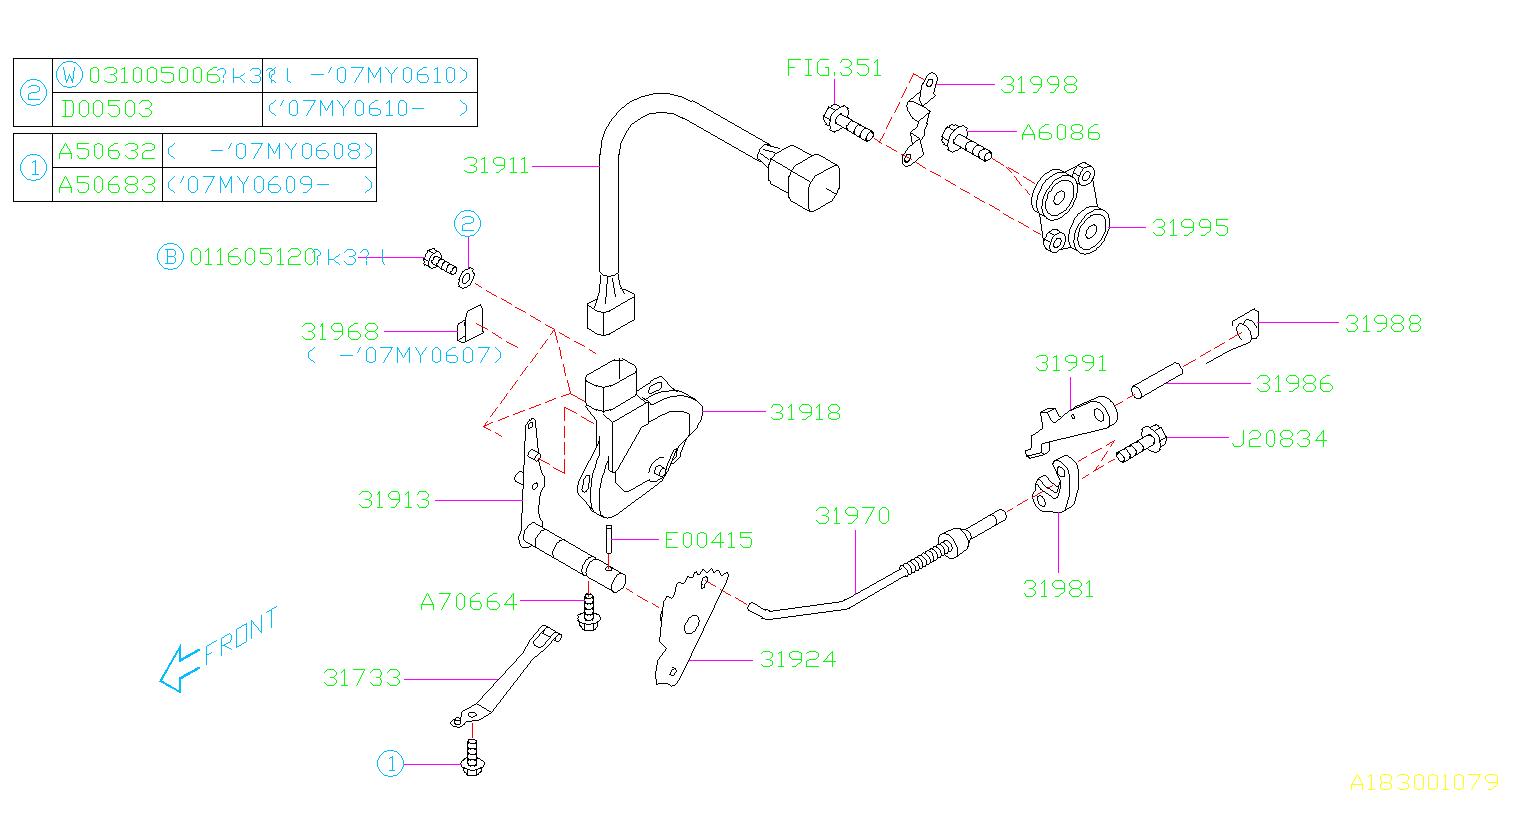 2005 Subaru Forester Automatic Transmission Gear Position Sensor  Device  Control  Inhibitor